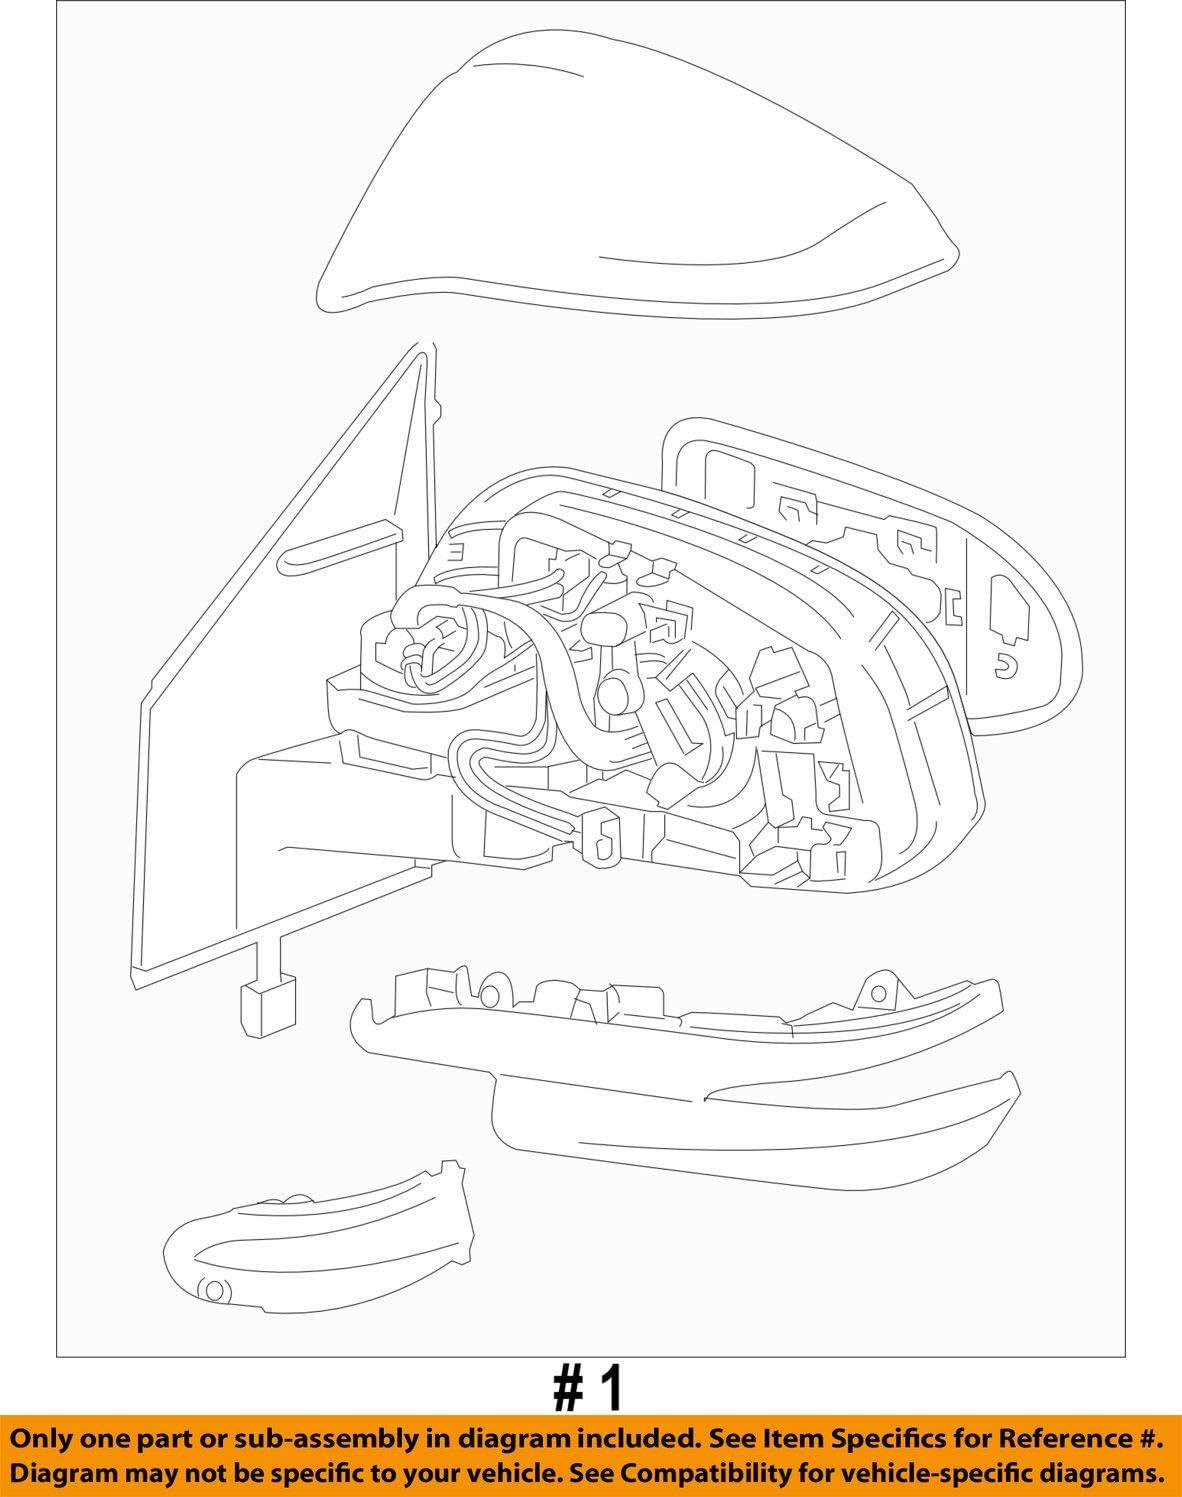 Genuine Toyota 87910-0R080-B1 Rear View Mirror Assembly